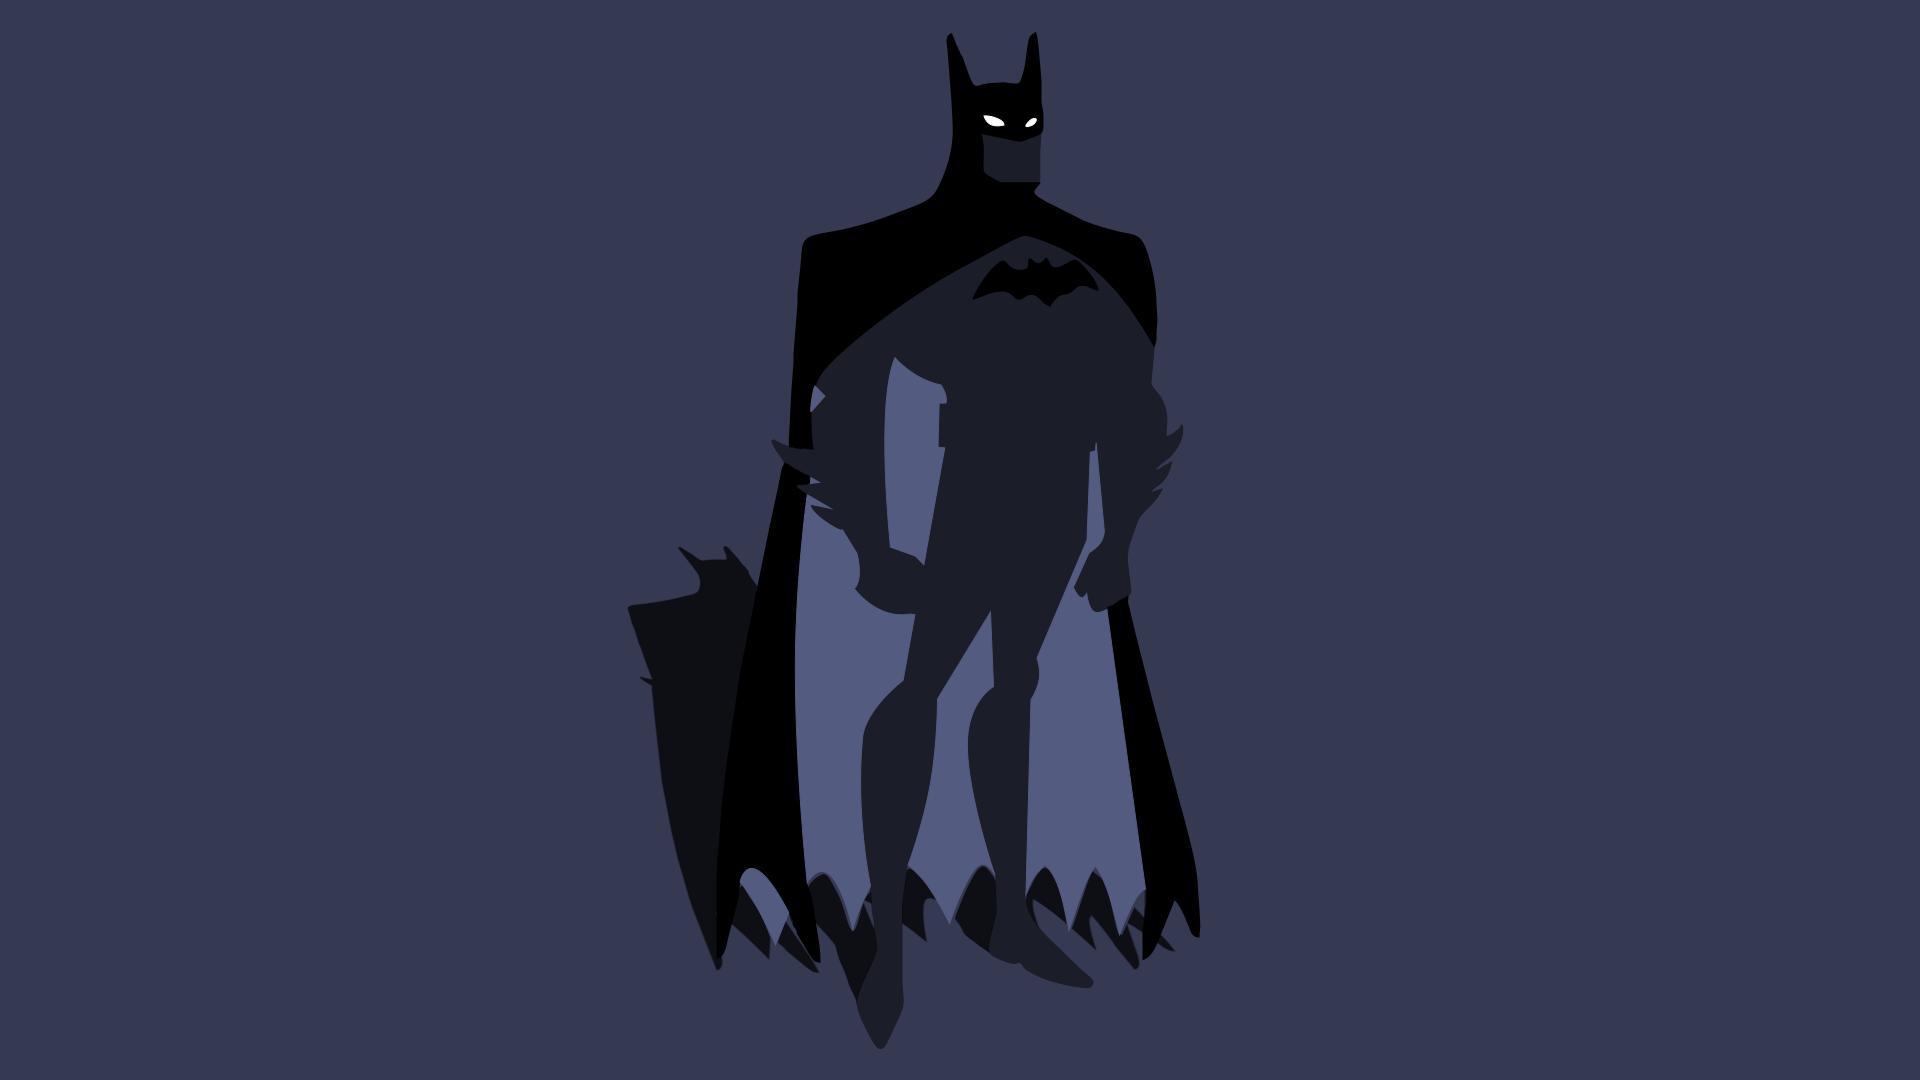 Minimal Batman Wallpaper by Cheetashock